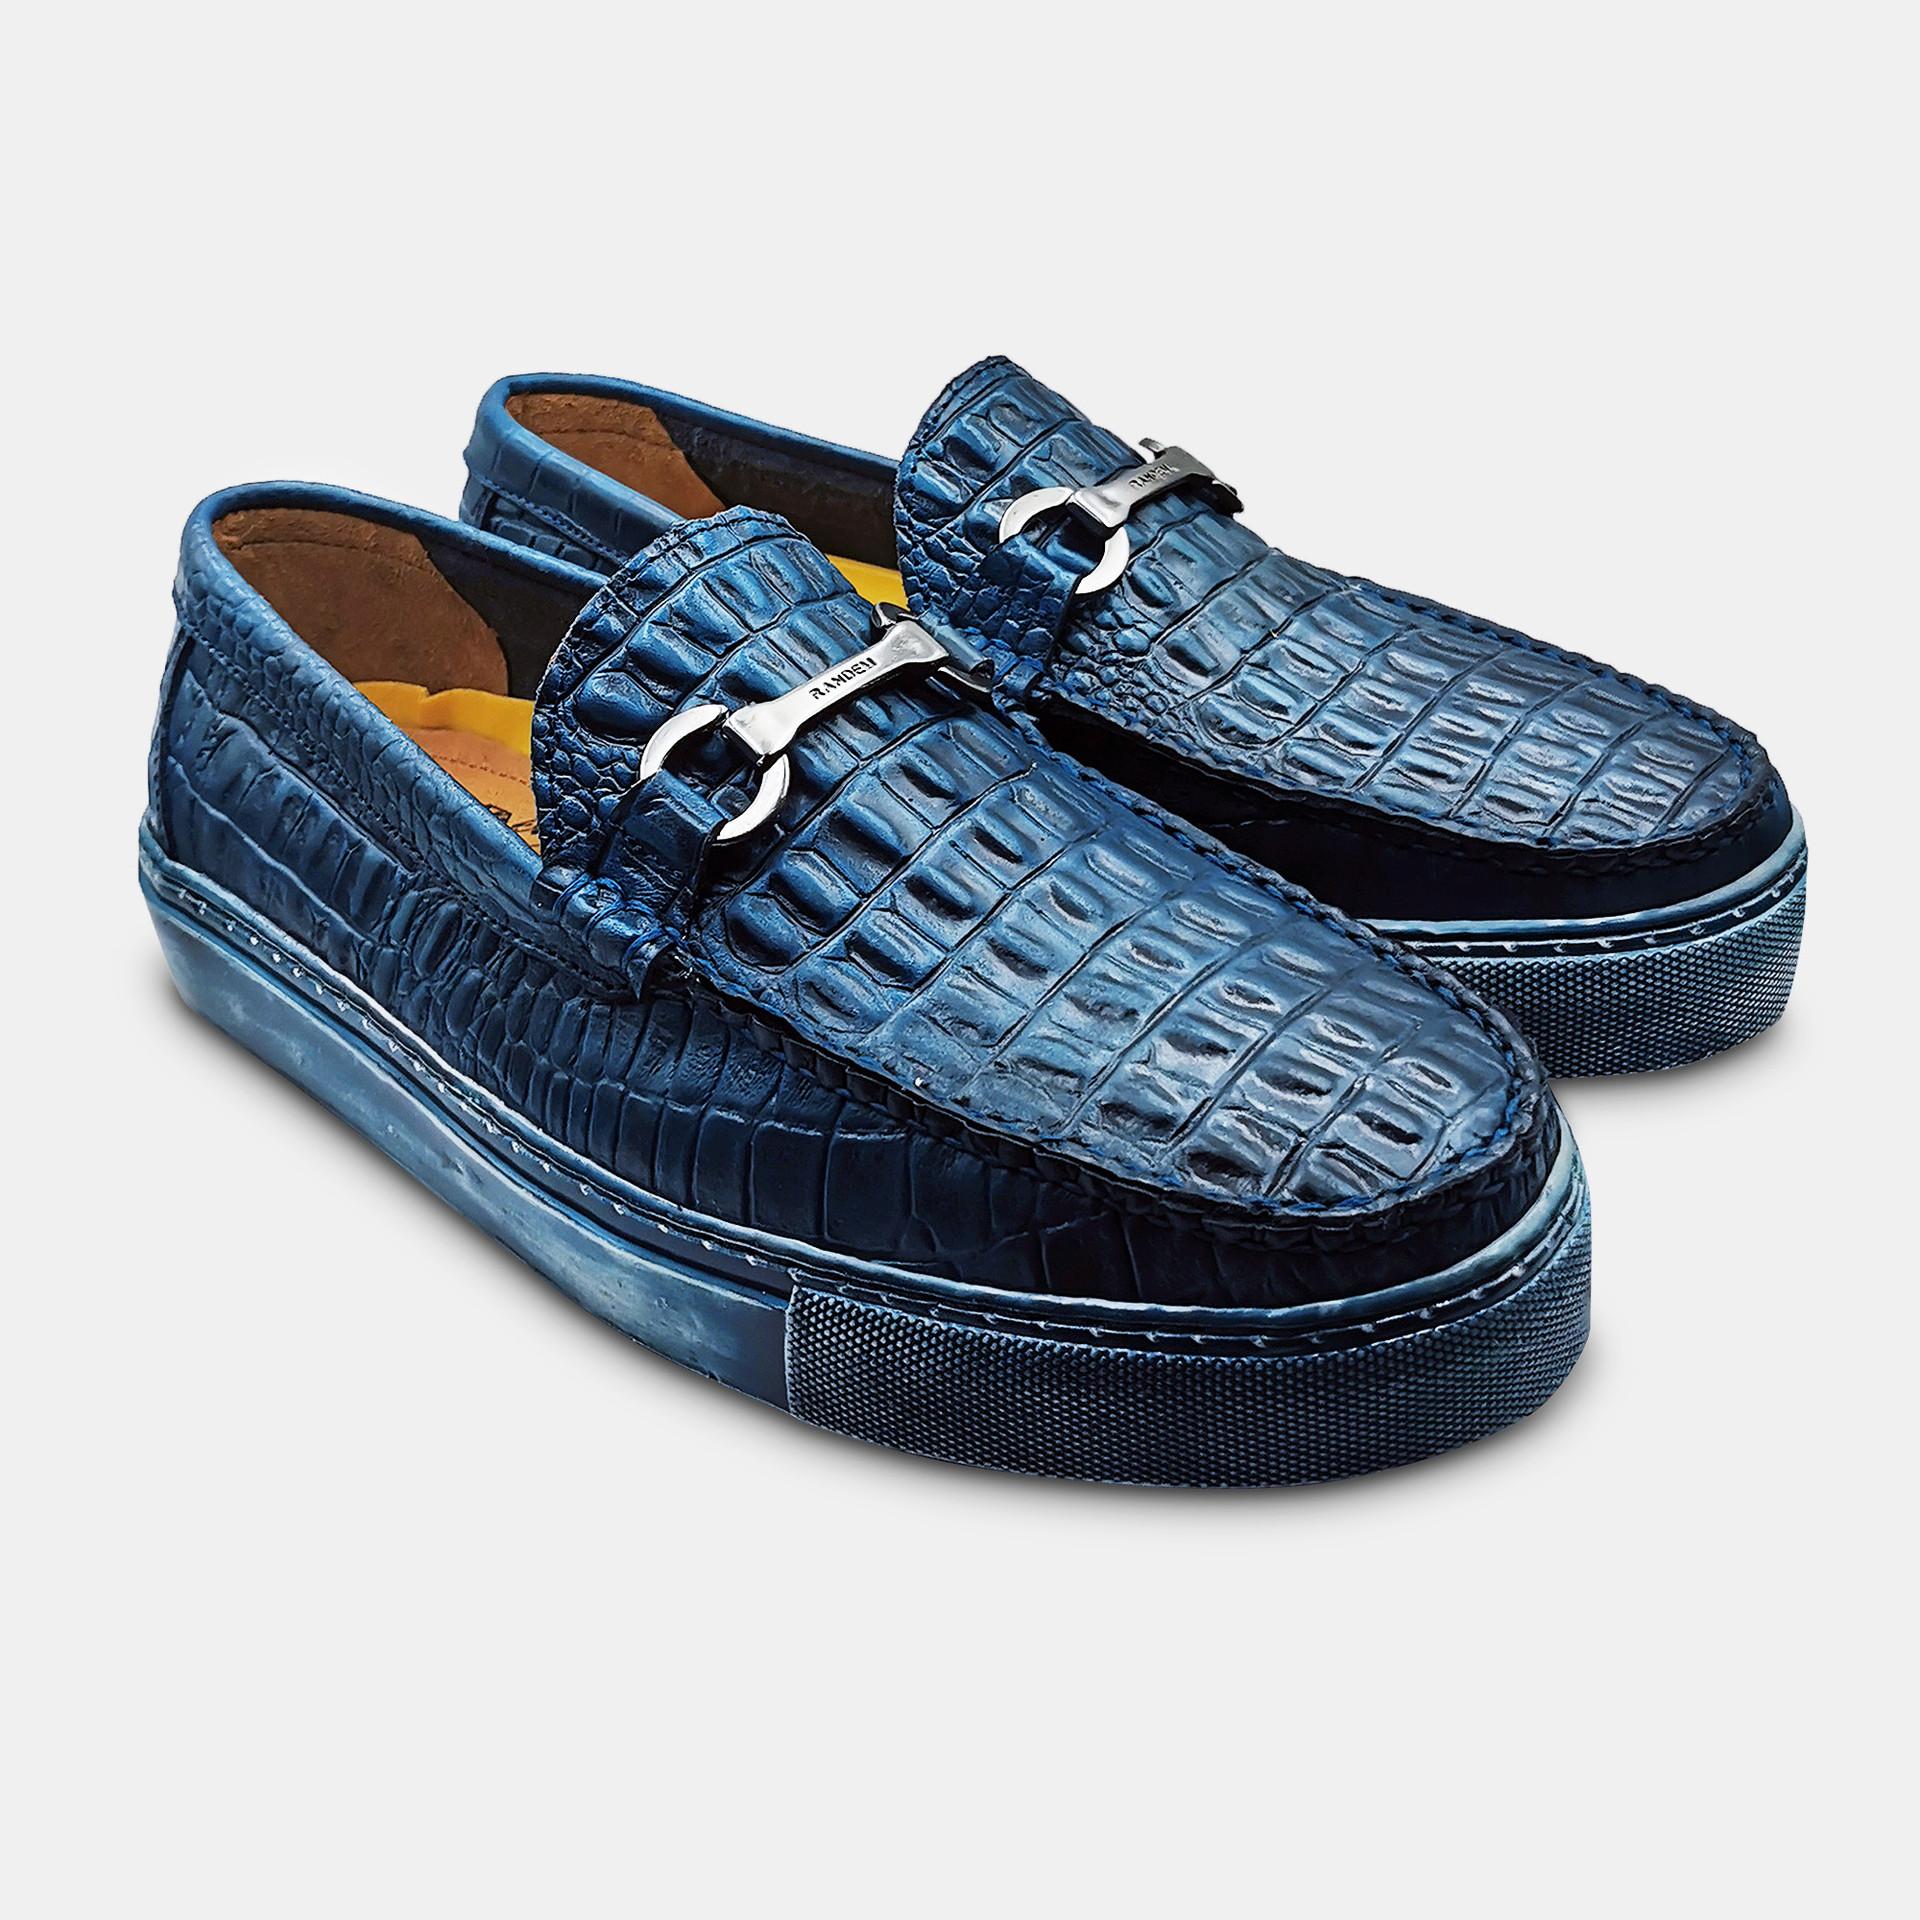 Sneakers-Spender-Randem-Croco-Marino(1).